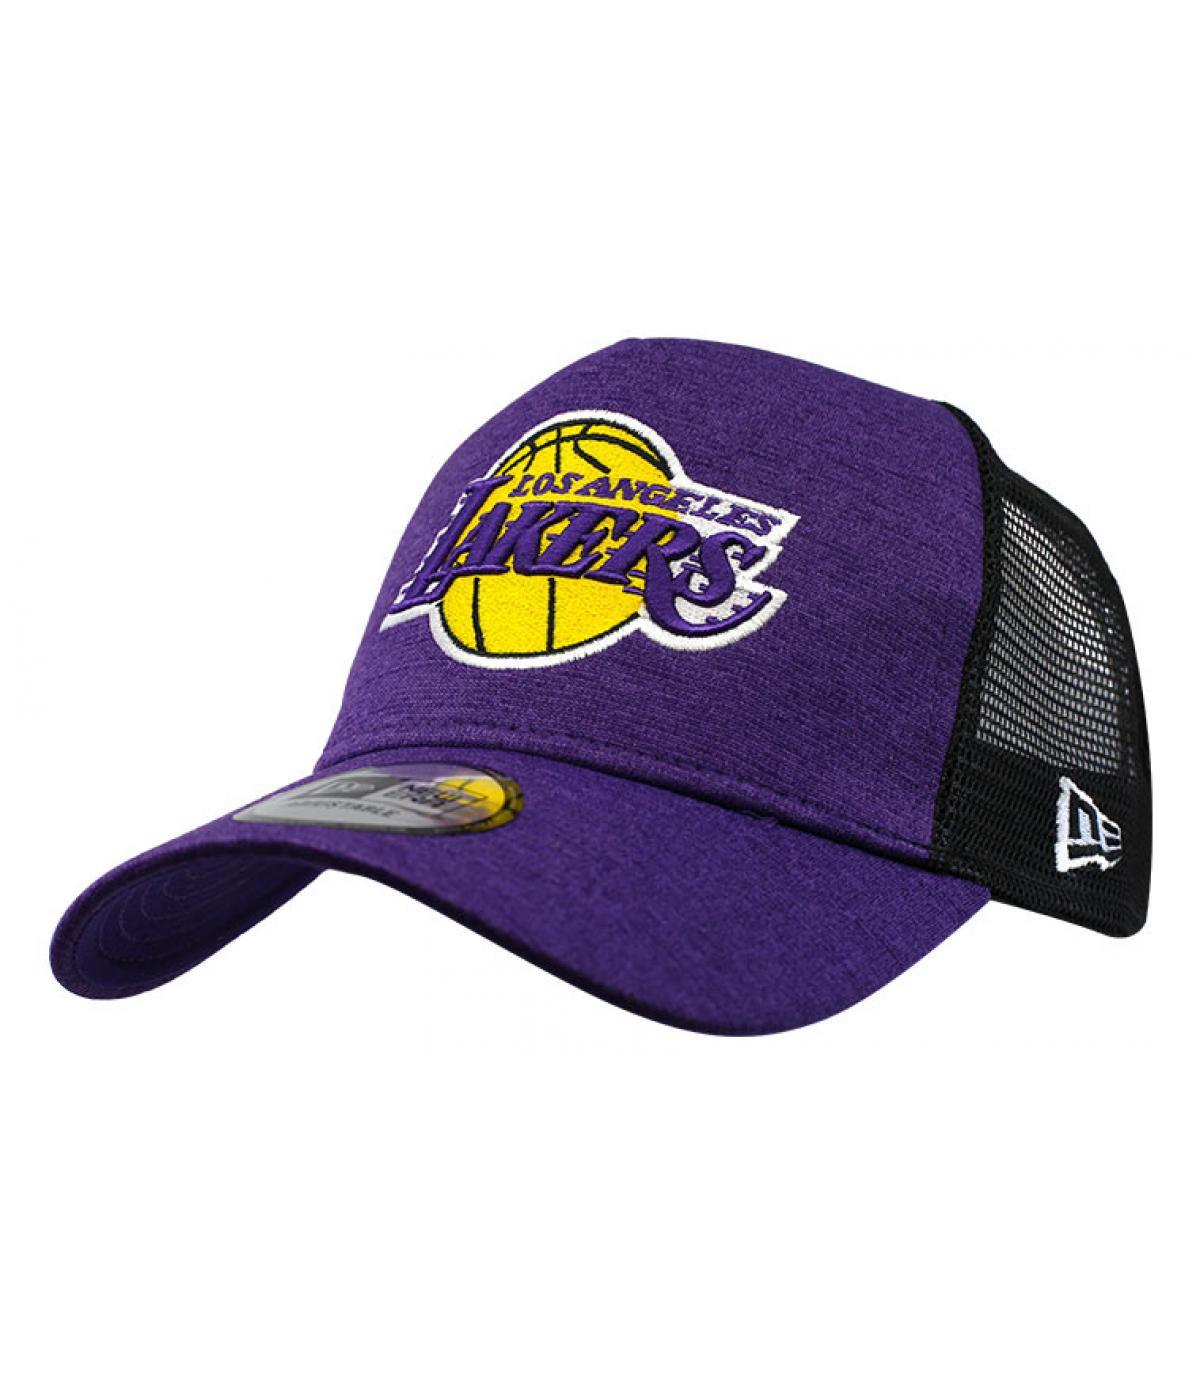 Détails Trucker Shadow Tech Lakers - image 2